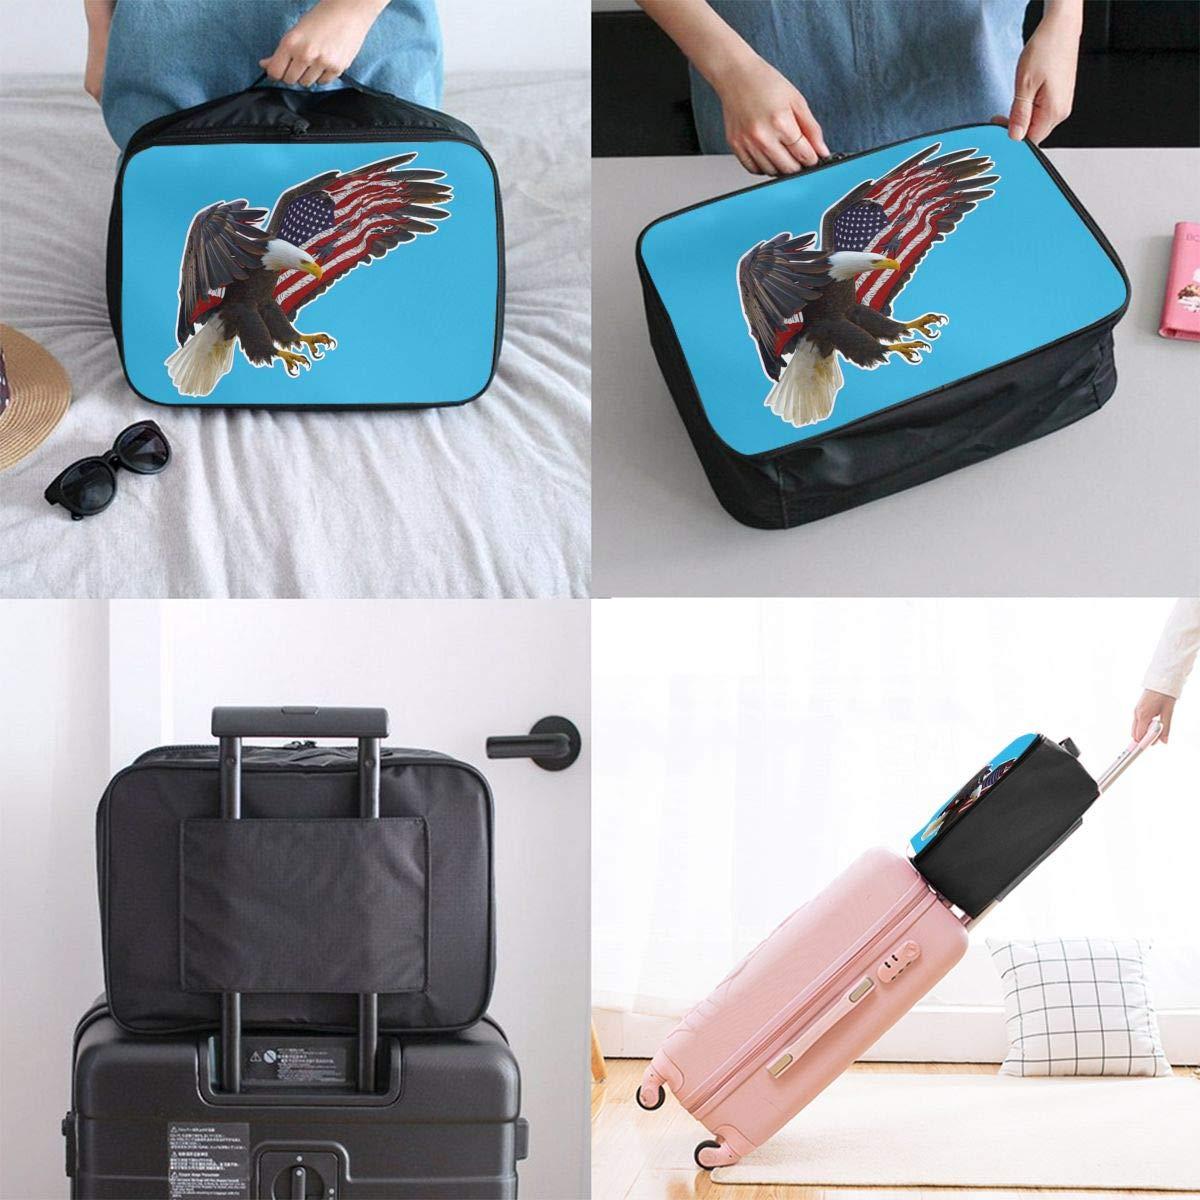 YueLJB American Eagle Flag Lightweight Large Capacity Portable Luggage Bag Travel Duffel Bag Storage Carry Luggage Duffle Tote Bag